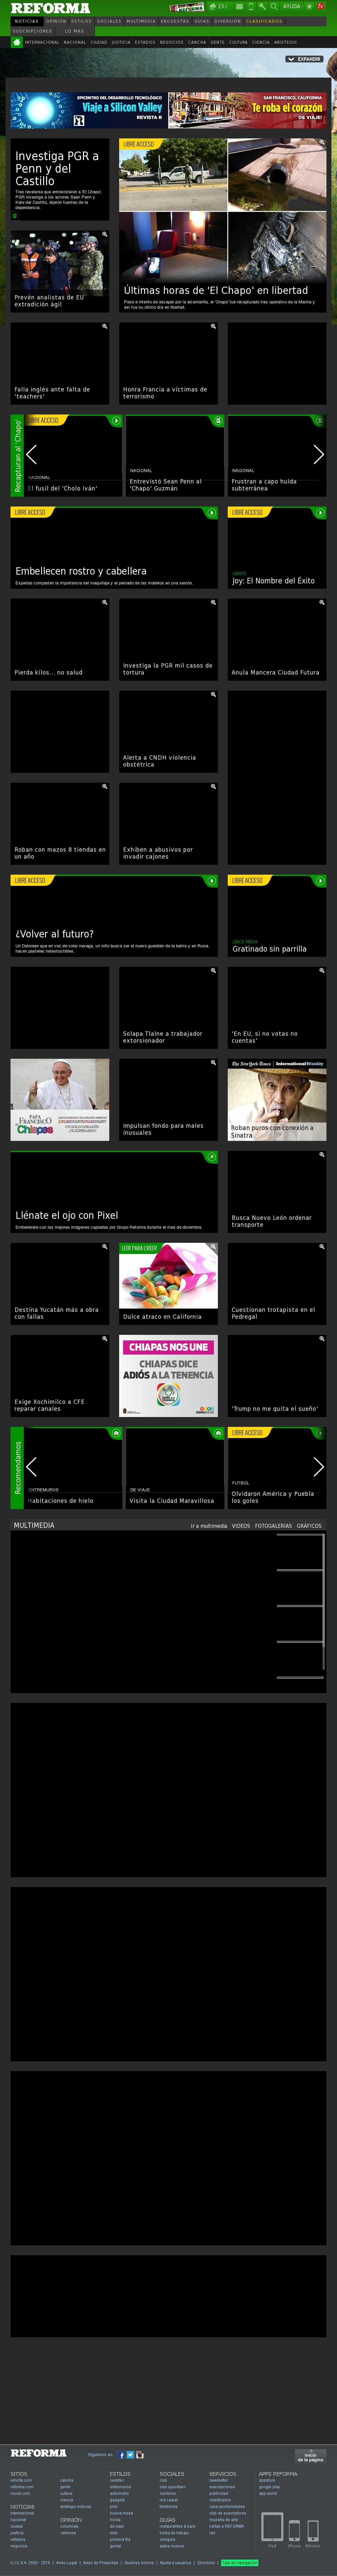 Reforma.com at Sunday Jan. 10, 2016, 5:19 p.m. UTC